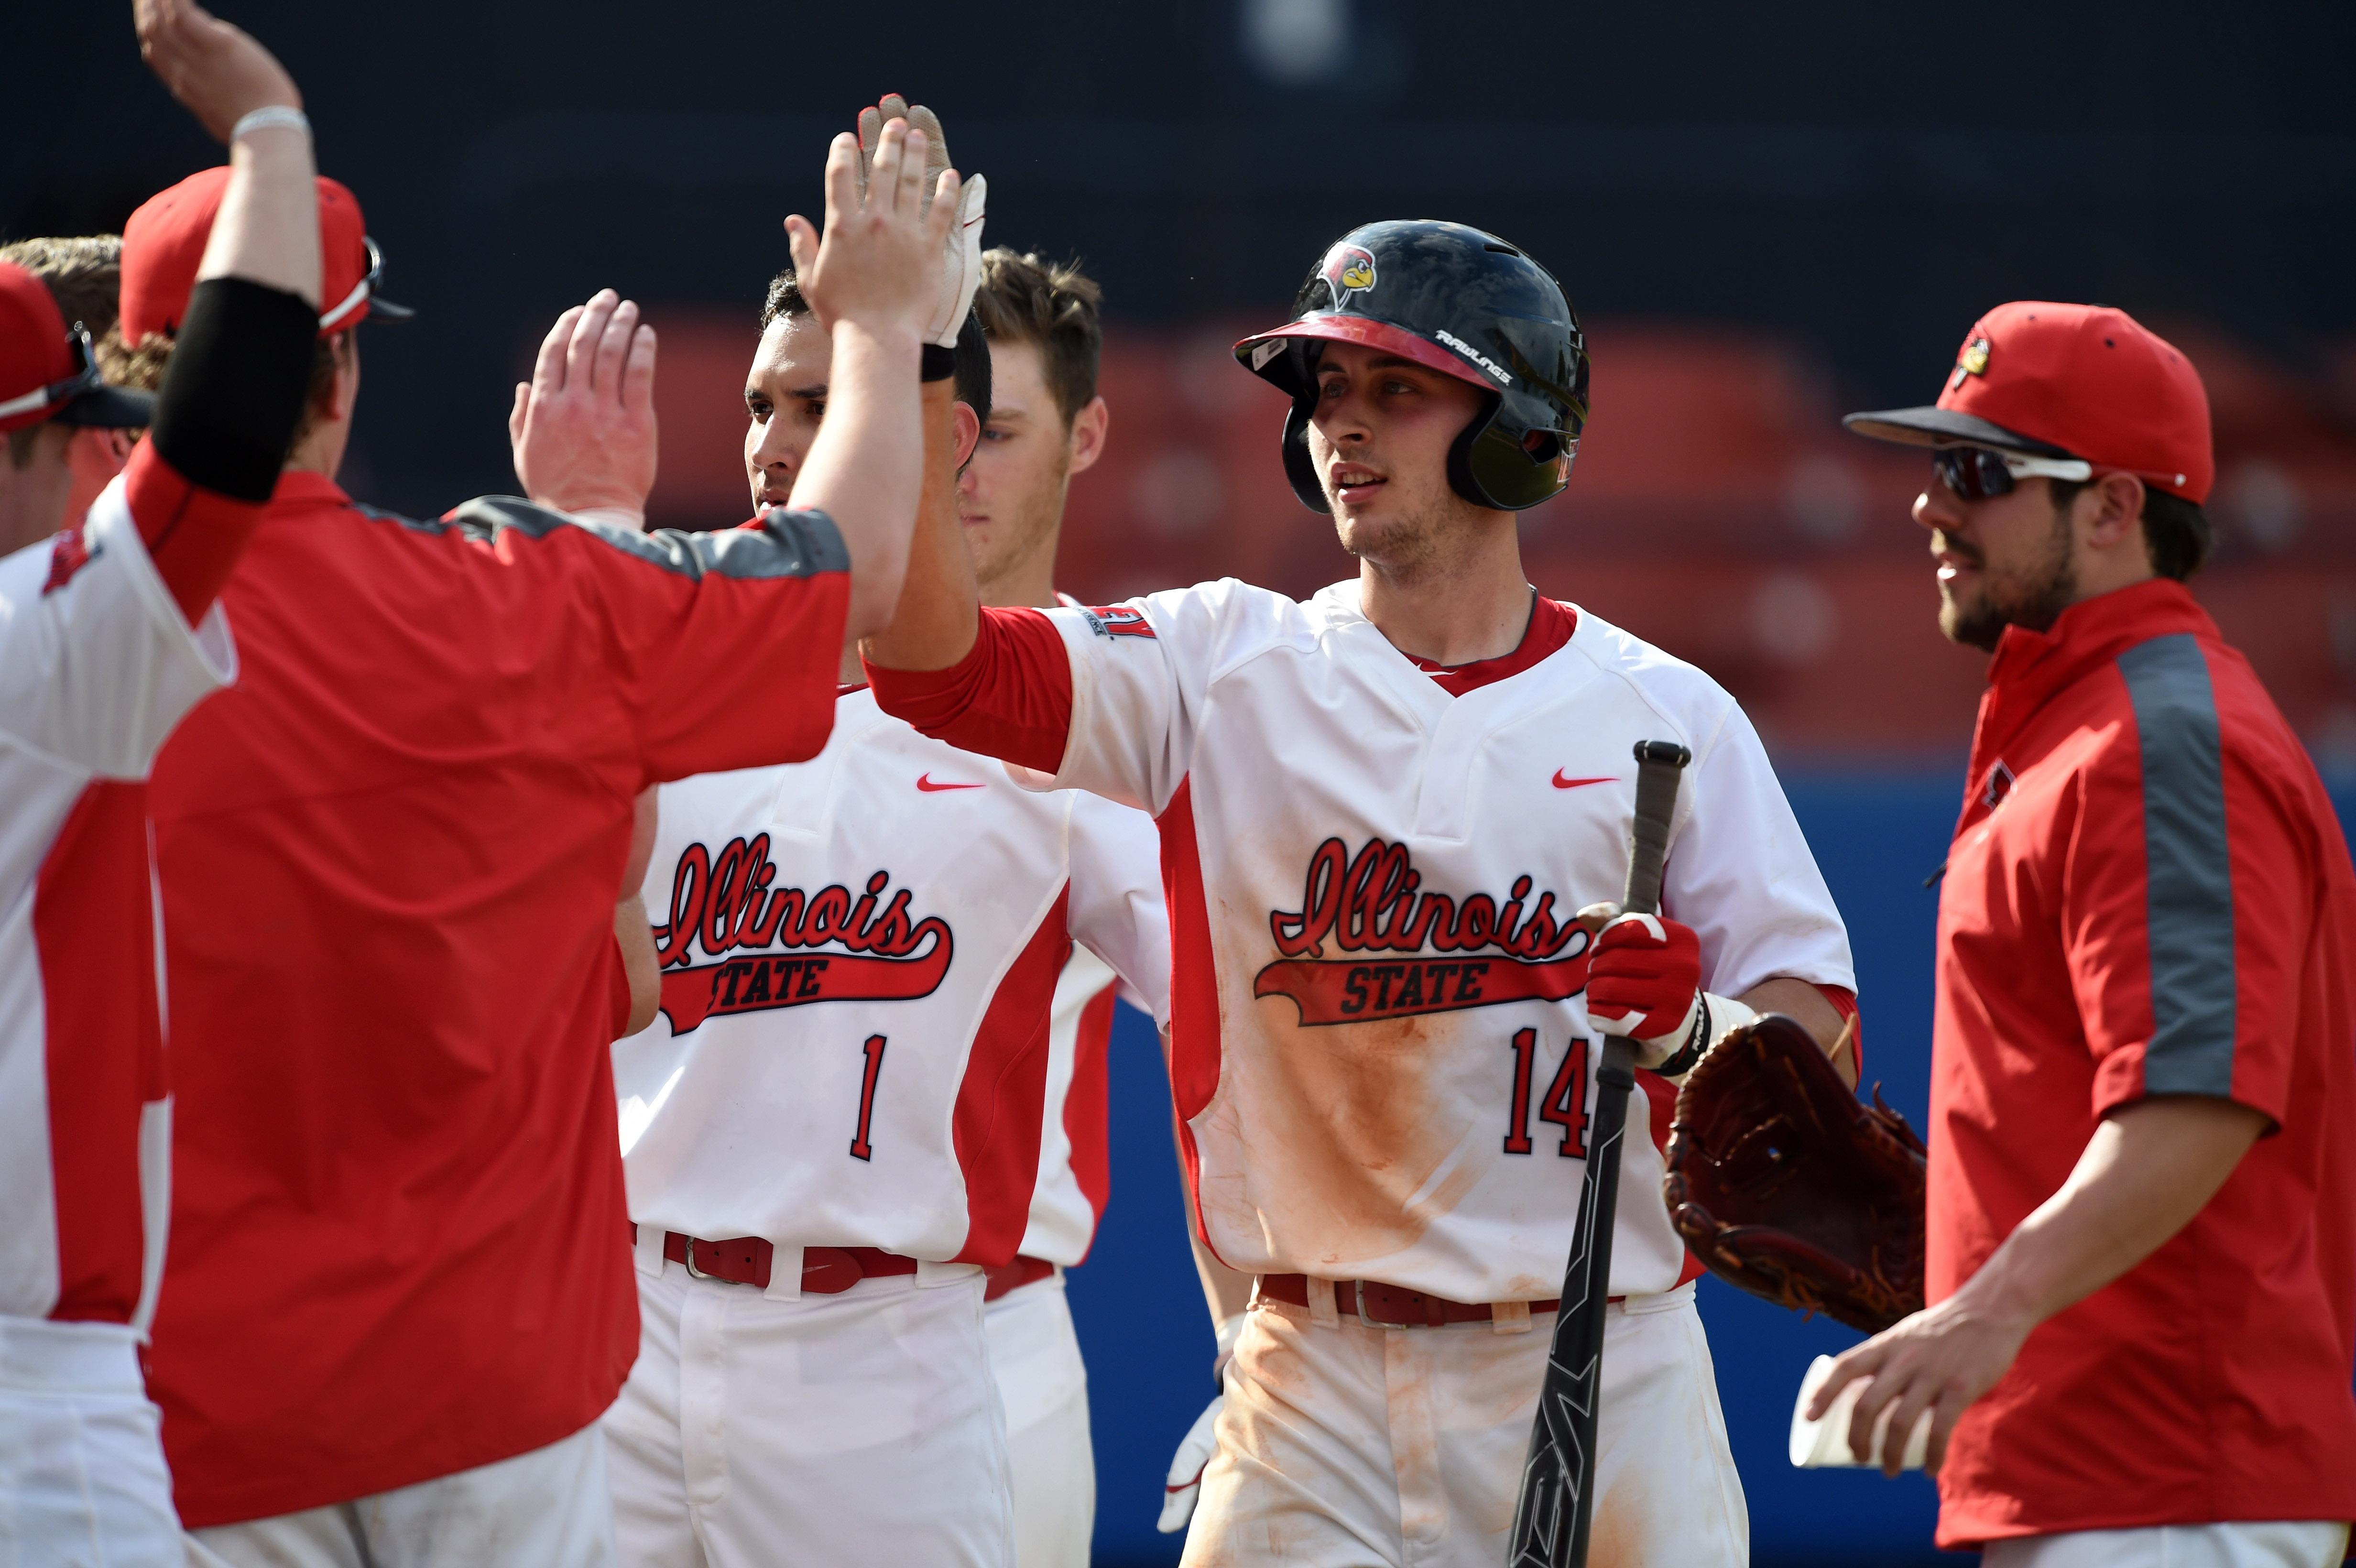 Paul DeJong high-fives teammates